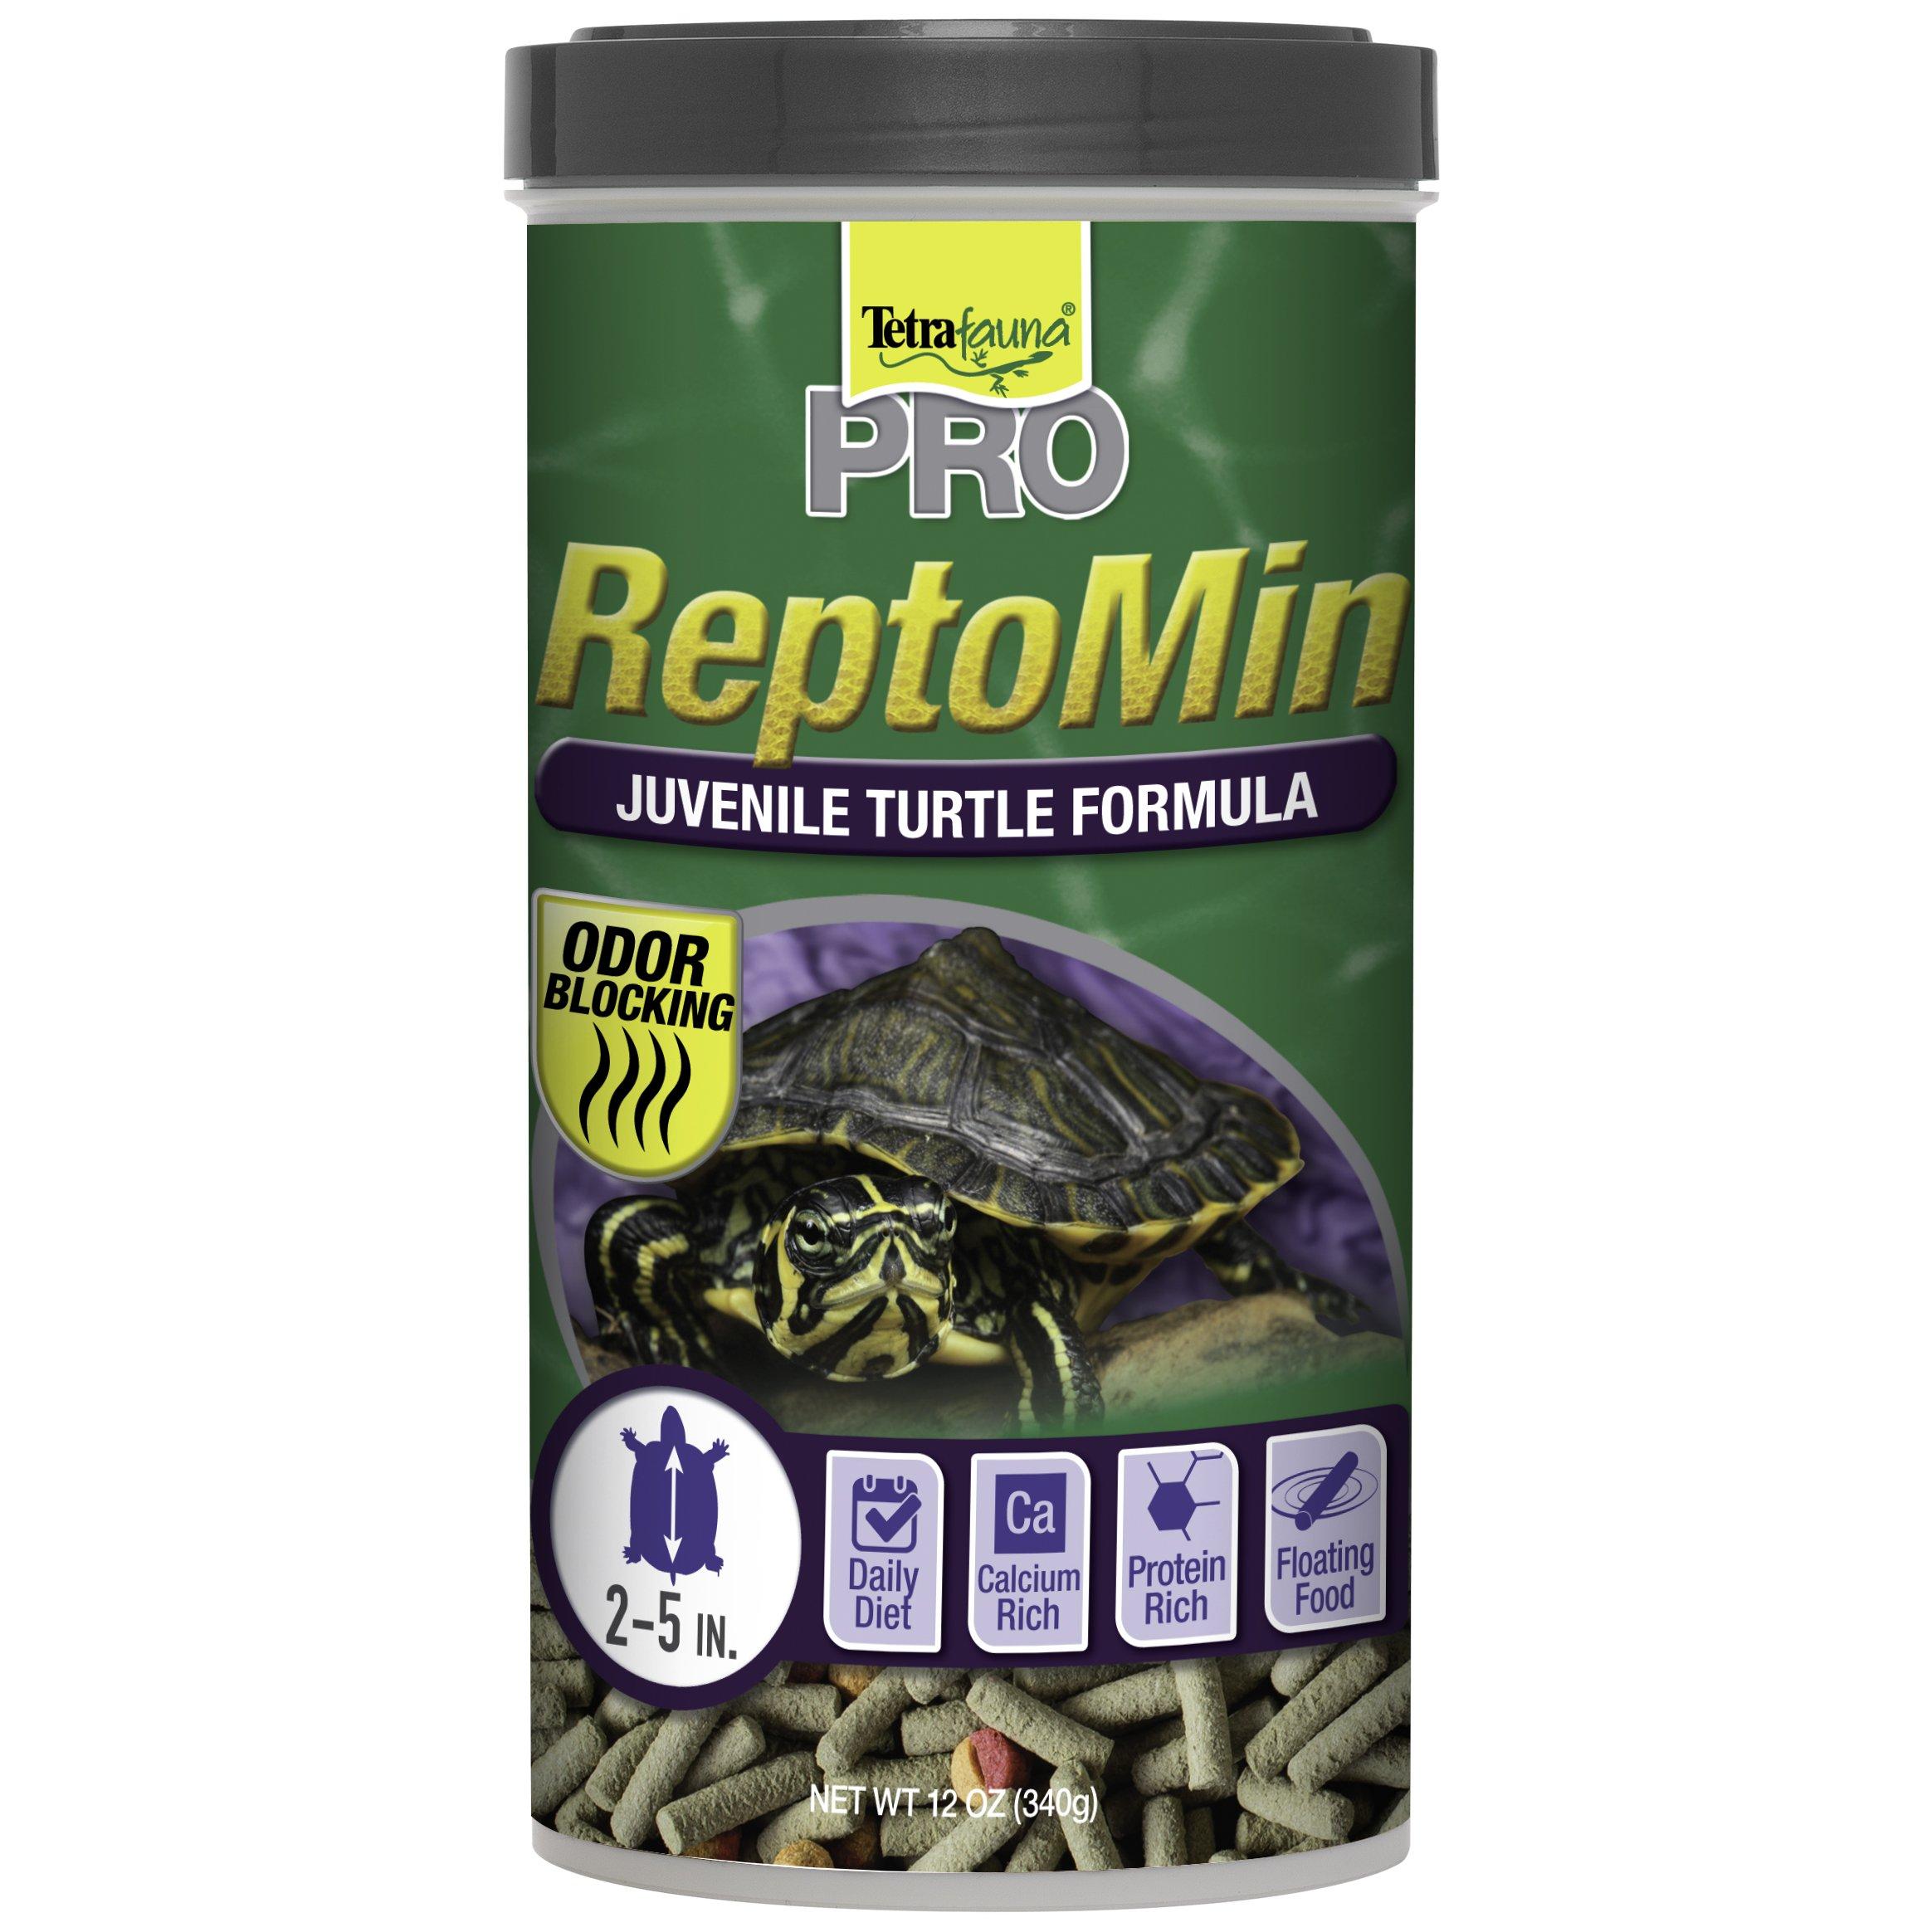 Tetra Tetrafauna Pro ReptoMin Juvenile Turtle Formula Sticks